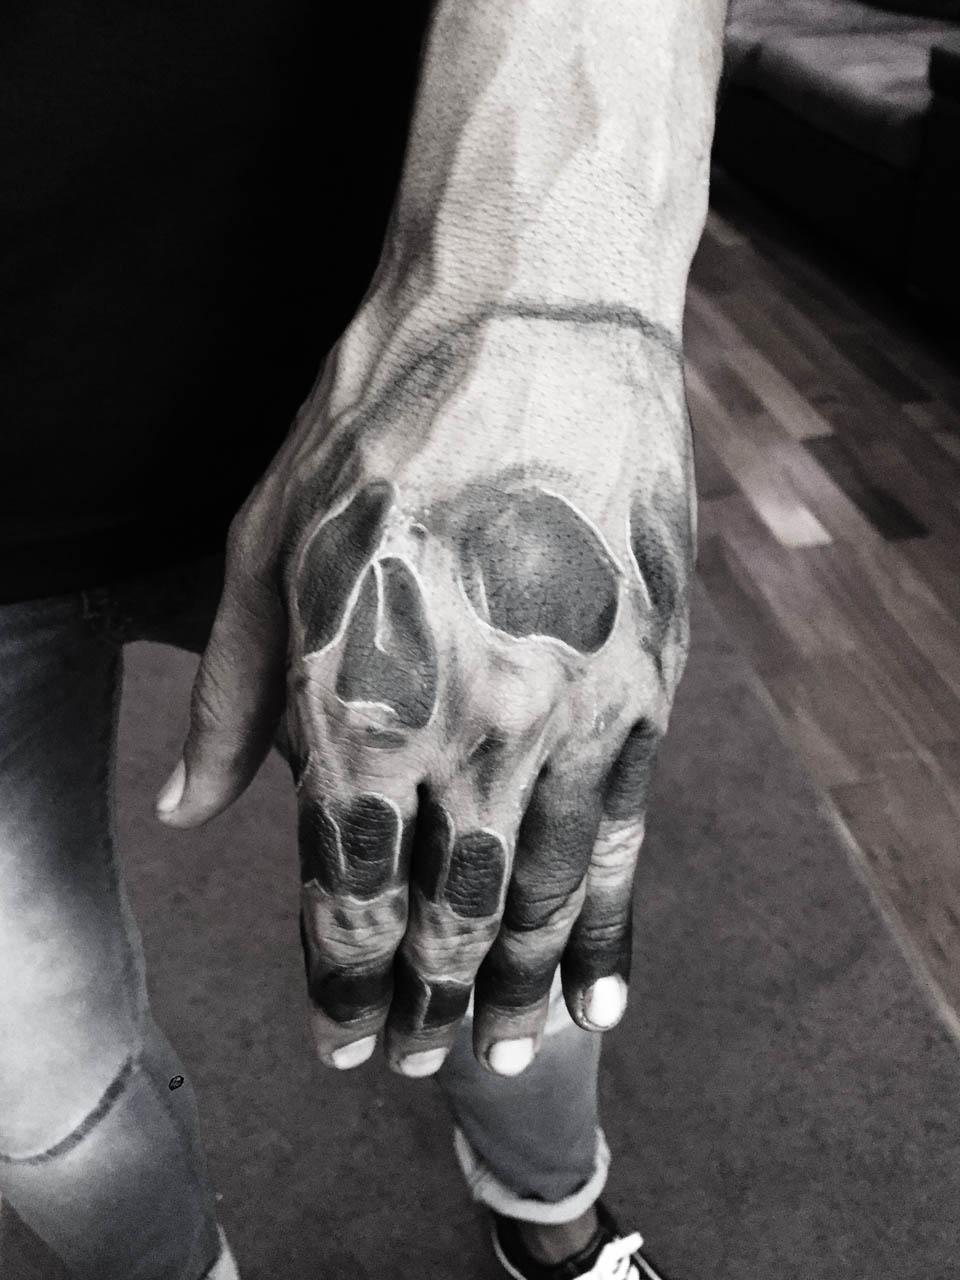 kevin-deuso-tattoo-025-black-grey-hand-fingers